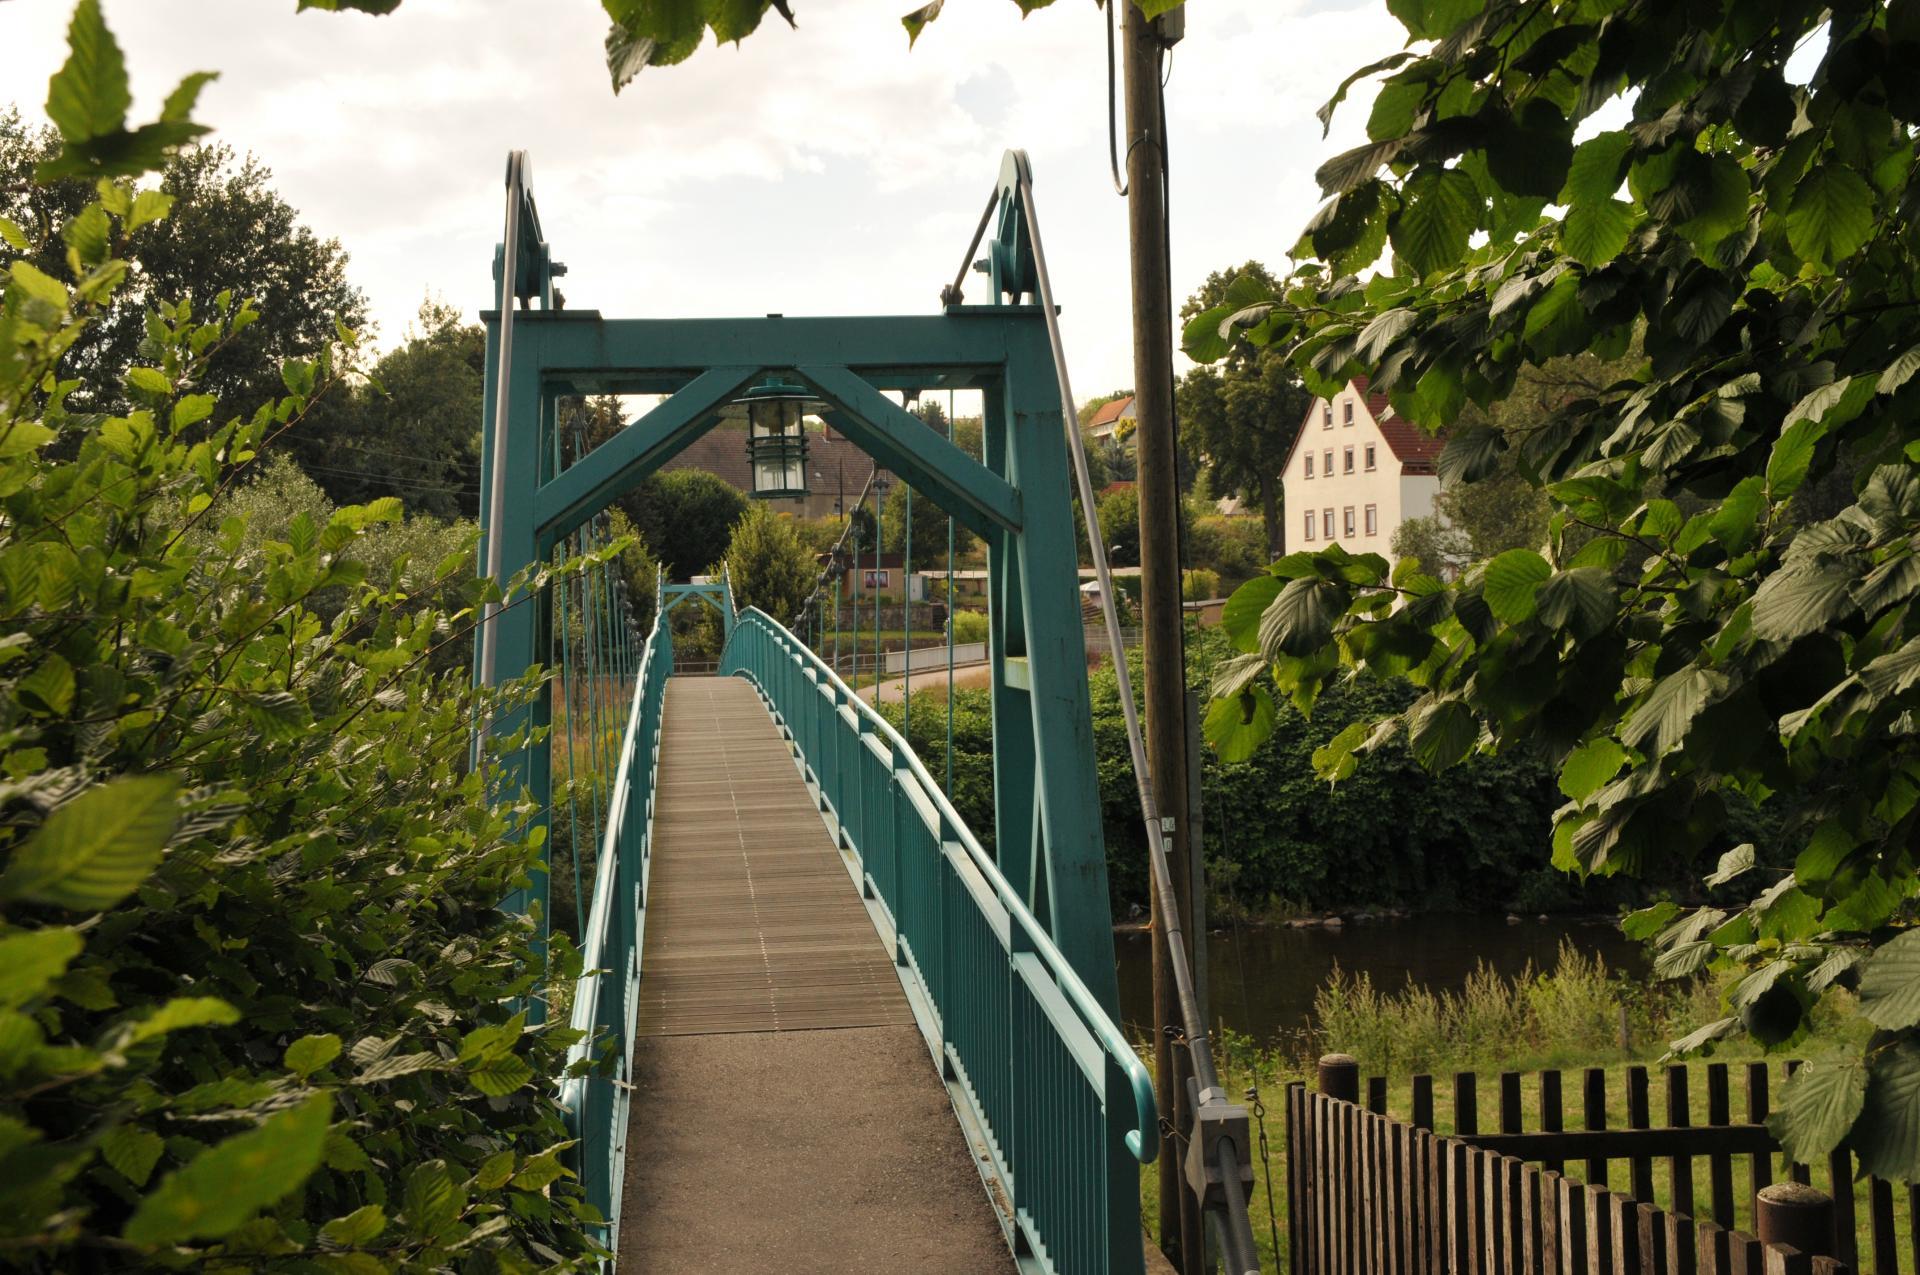 Brücke Thierbach-Zinnberg